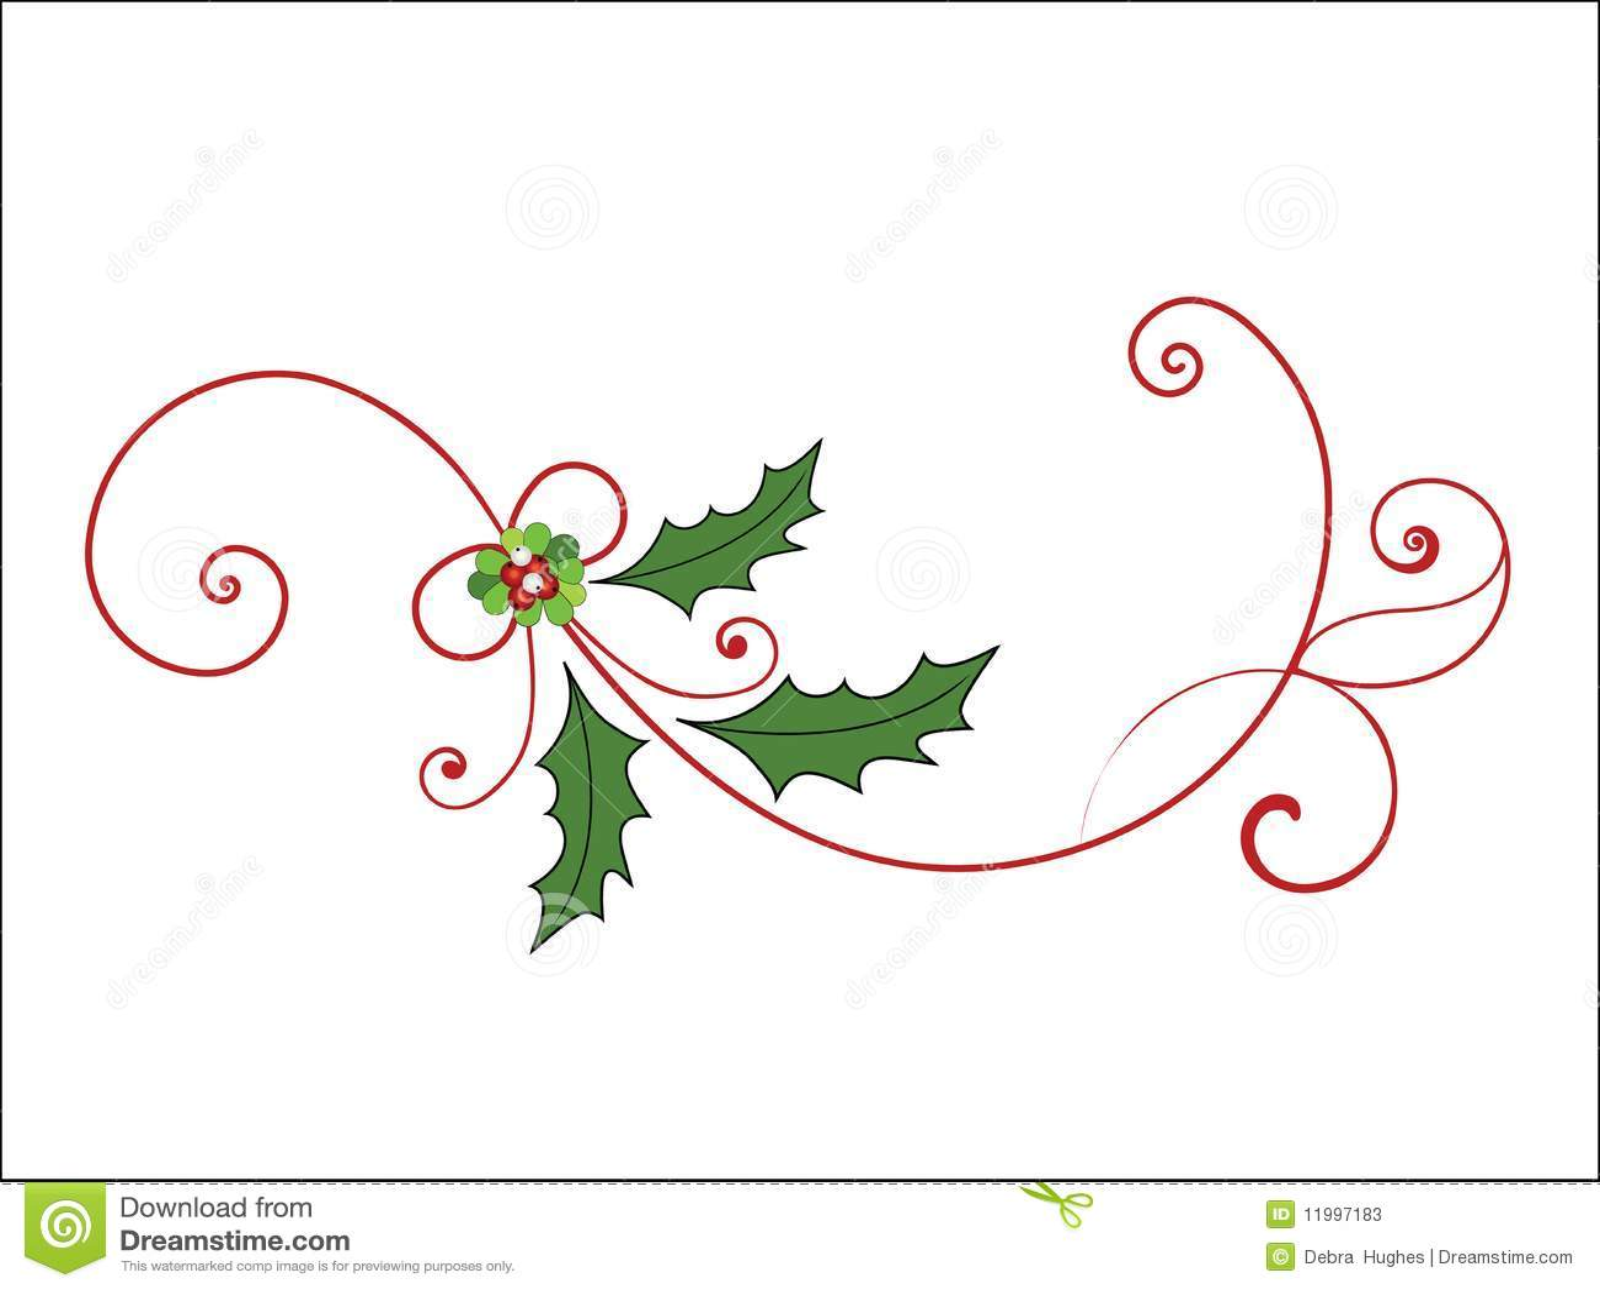 Elegant Christmas Flourish Stock Photos - Image: 11997183